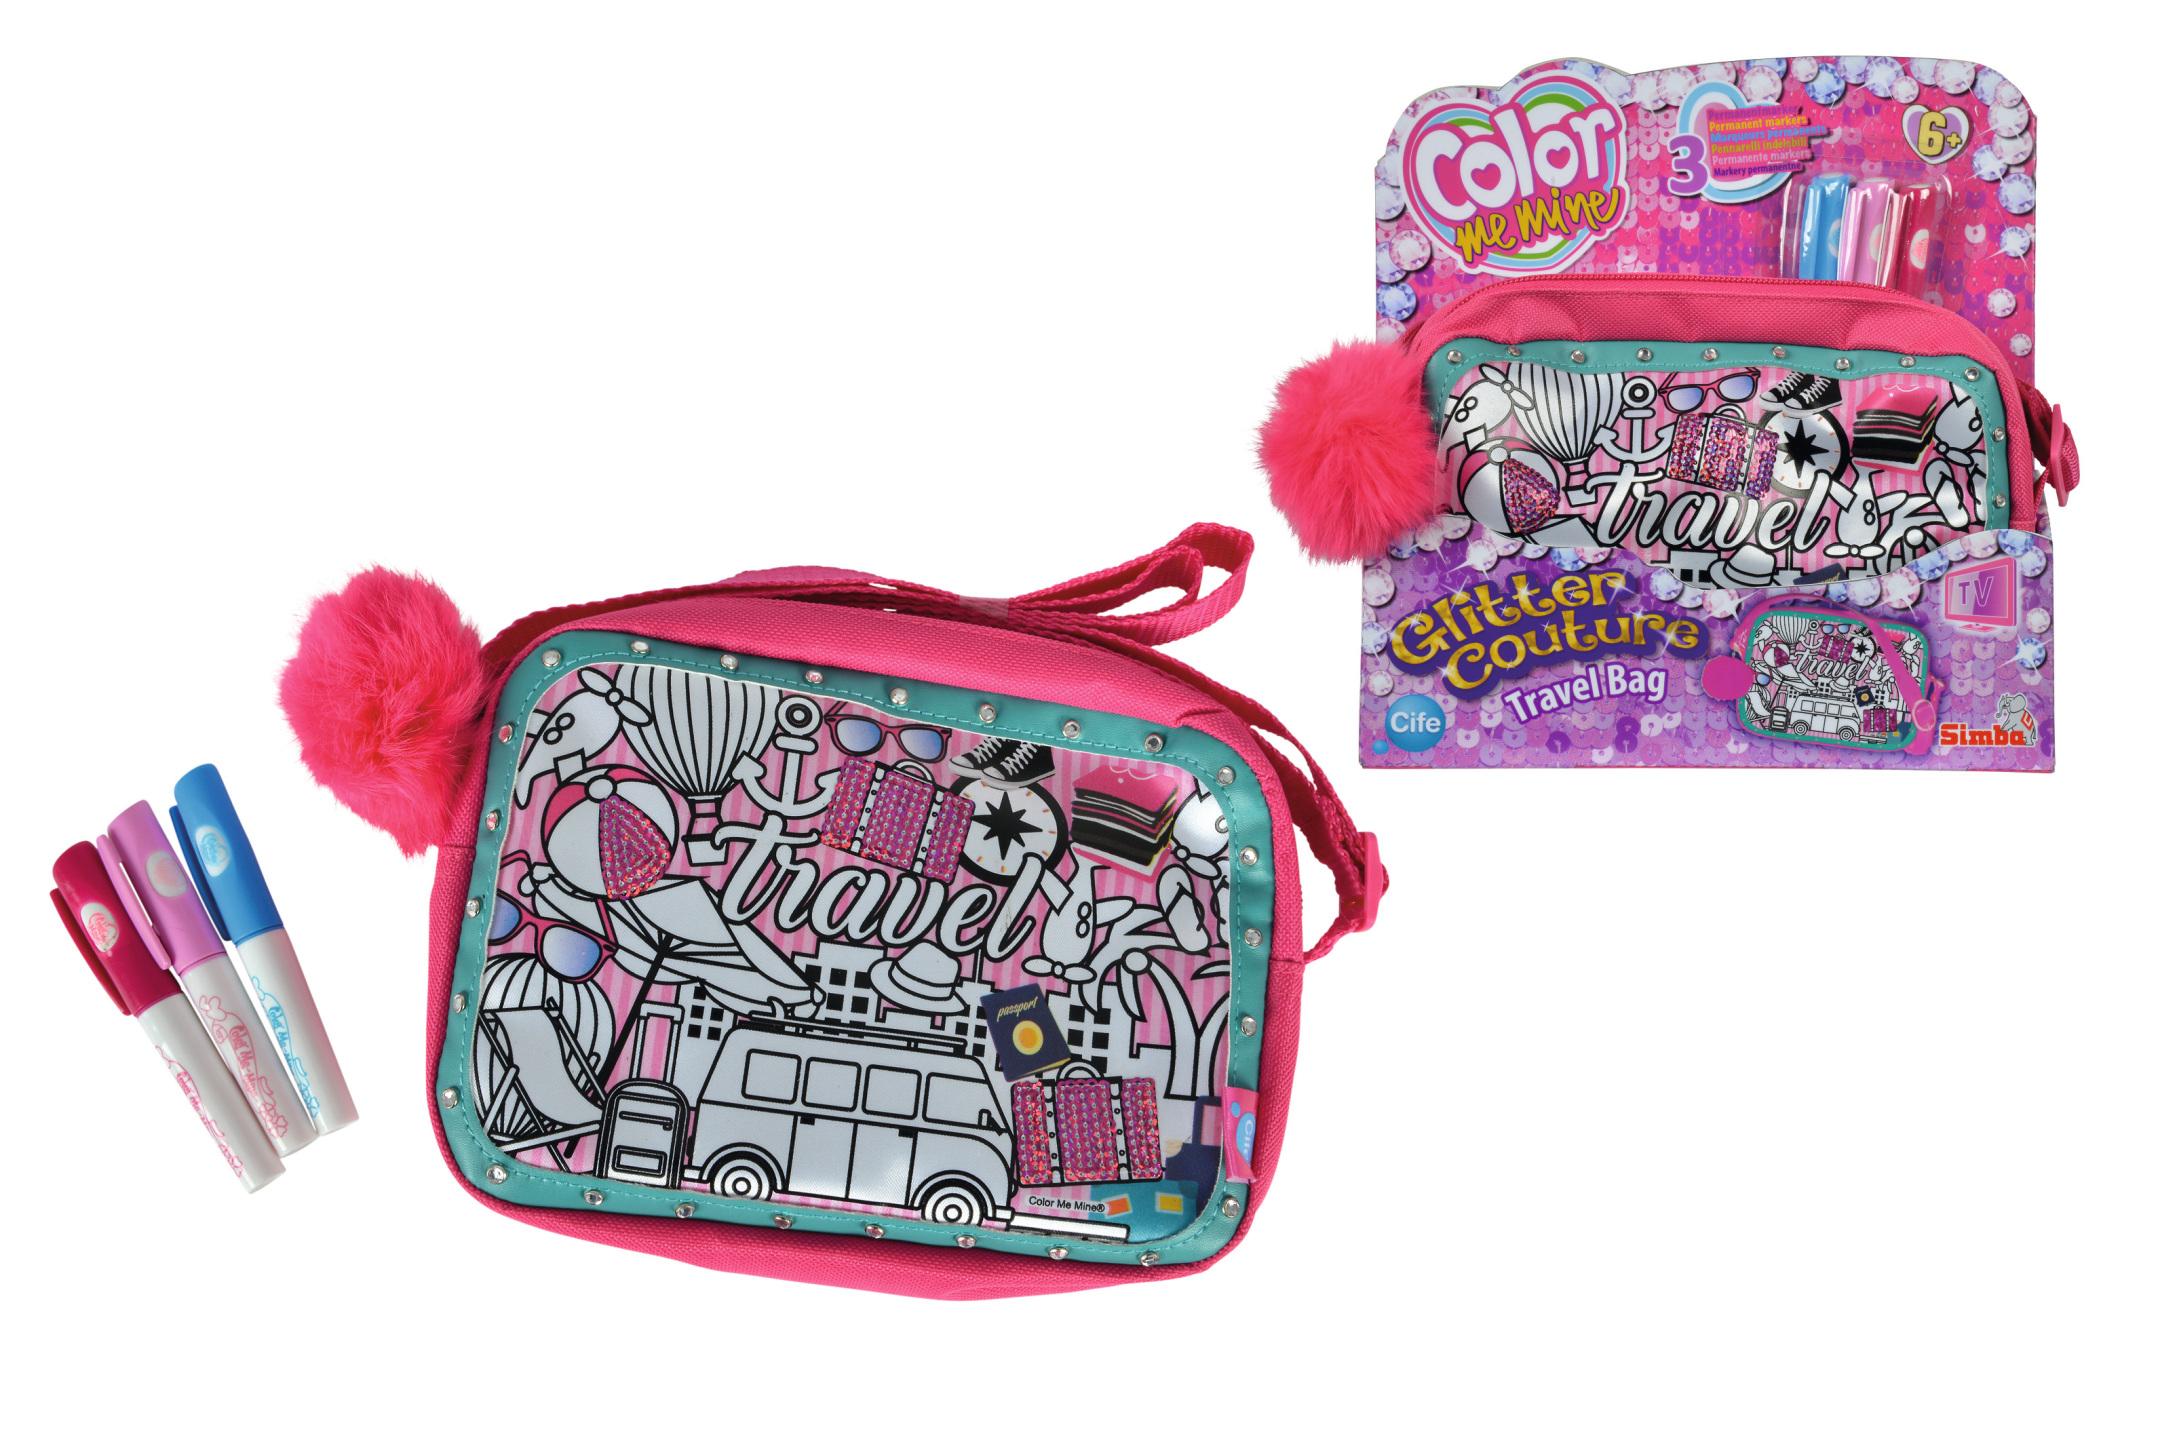 Color Me Mine Glitter Couture Travel Bag